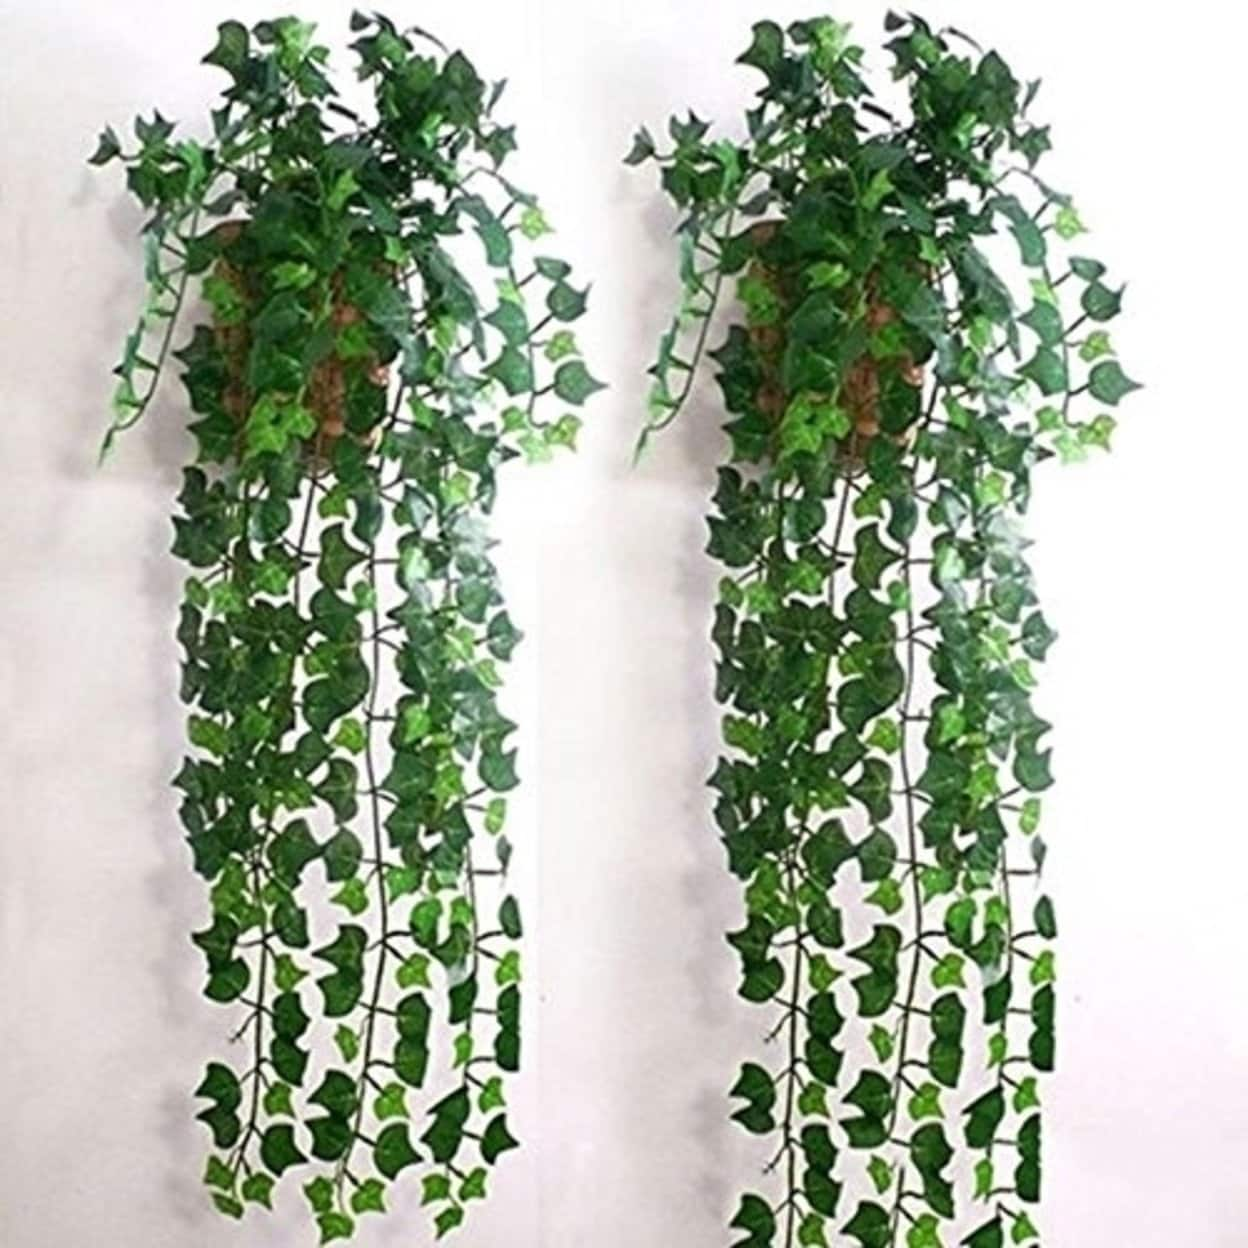 Artificial Ivy Leaf Garland Plants Vine Fake Foliage Flowers Home Decor Plastic Artificial Flower Overstock 27727860